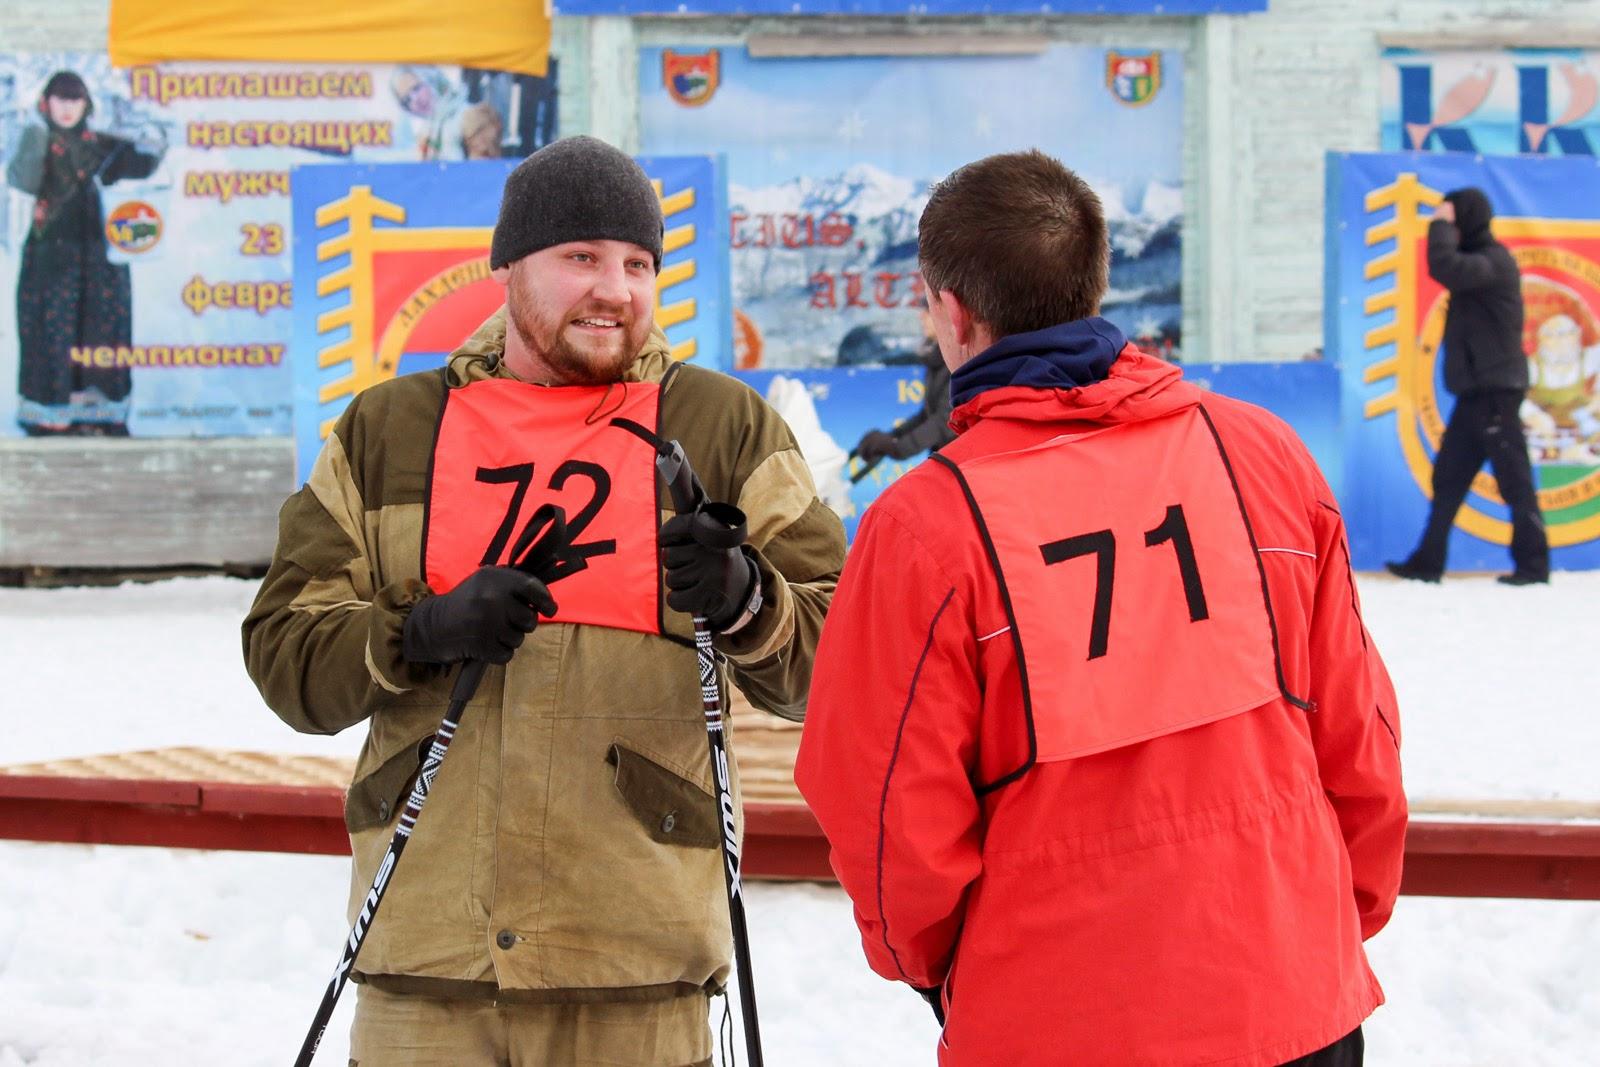 Александр Рогаткин на чемпионате 2015 в Лахденпохья